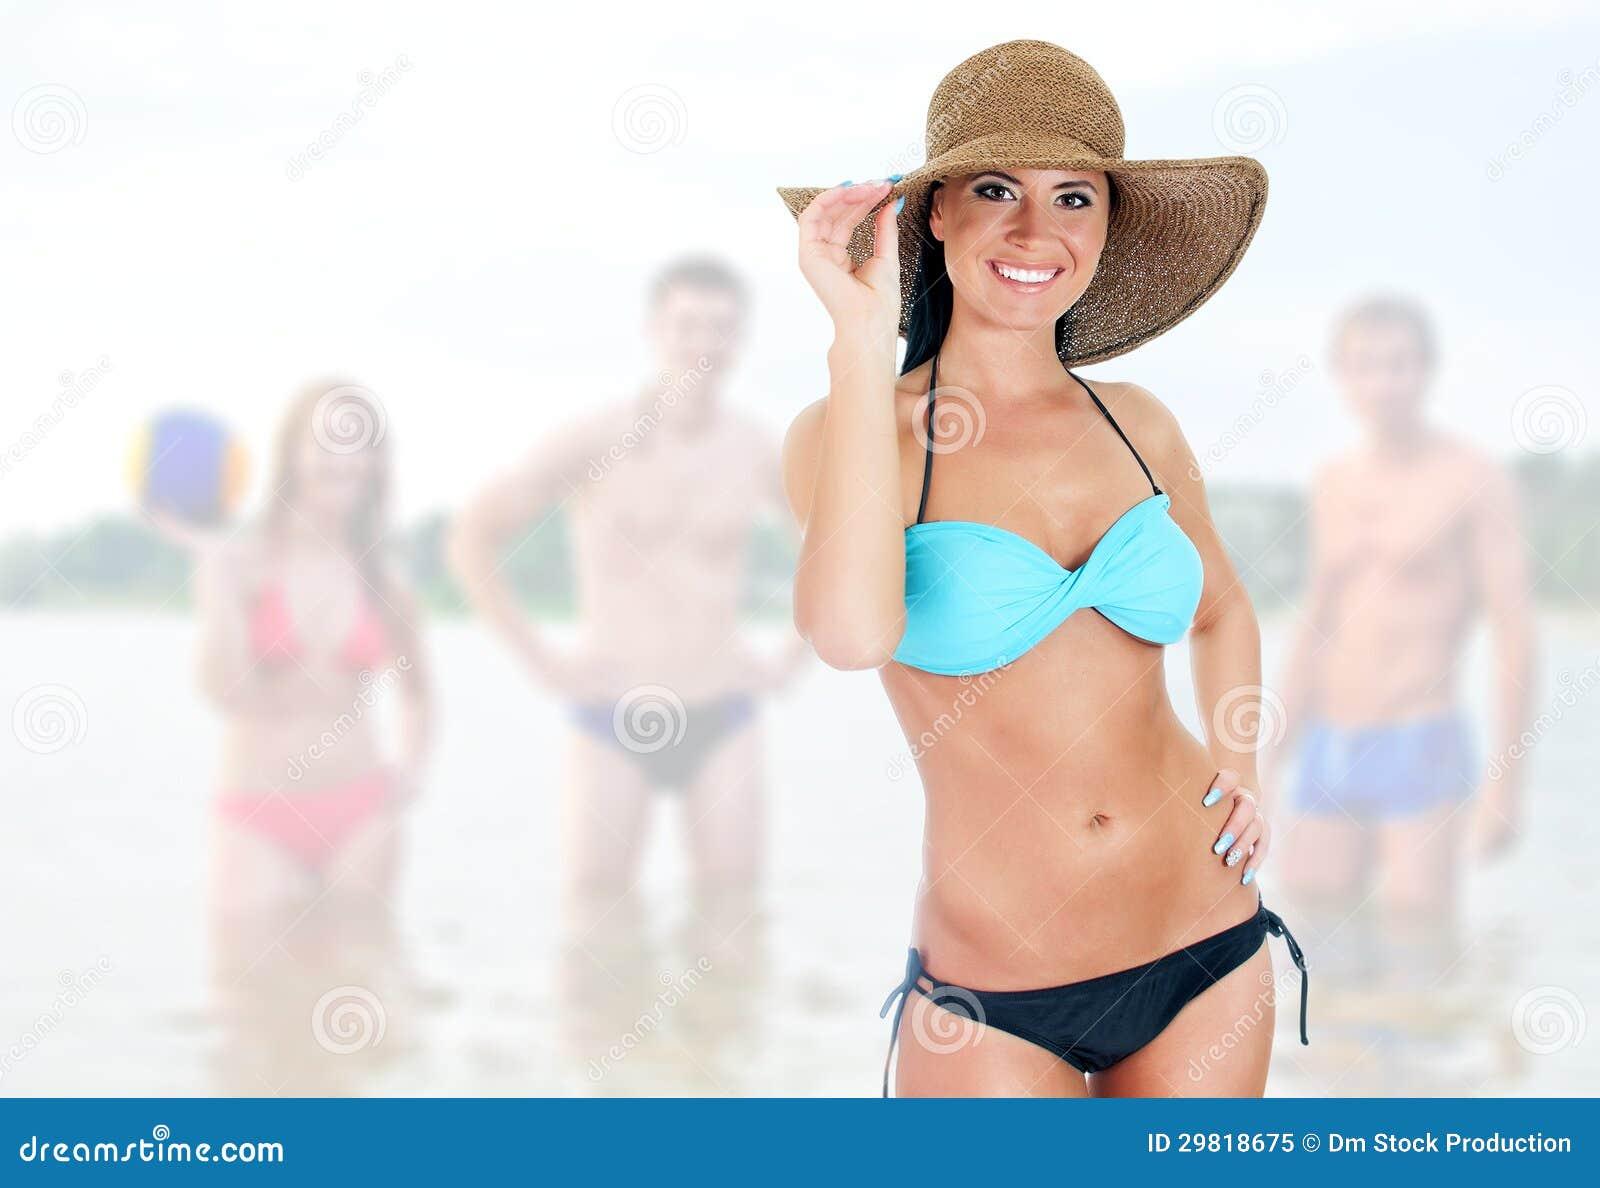 gratis sexchat be mooie vrouwen in bikini